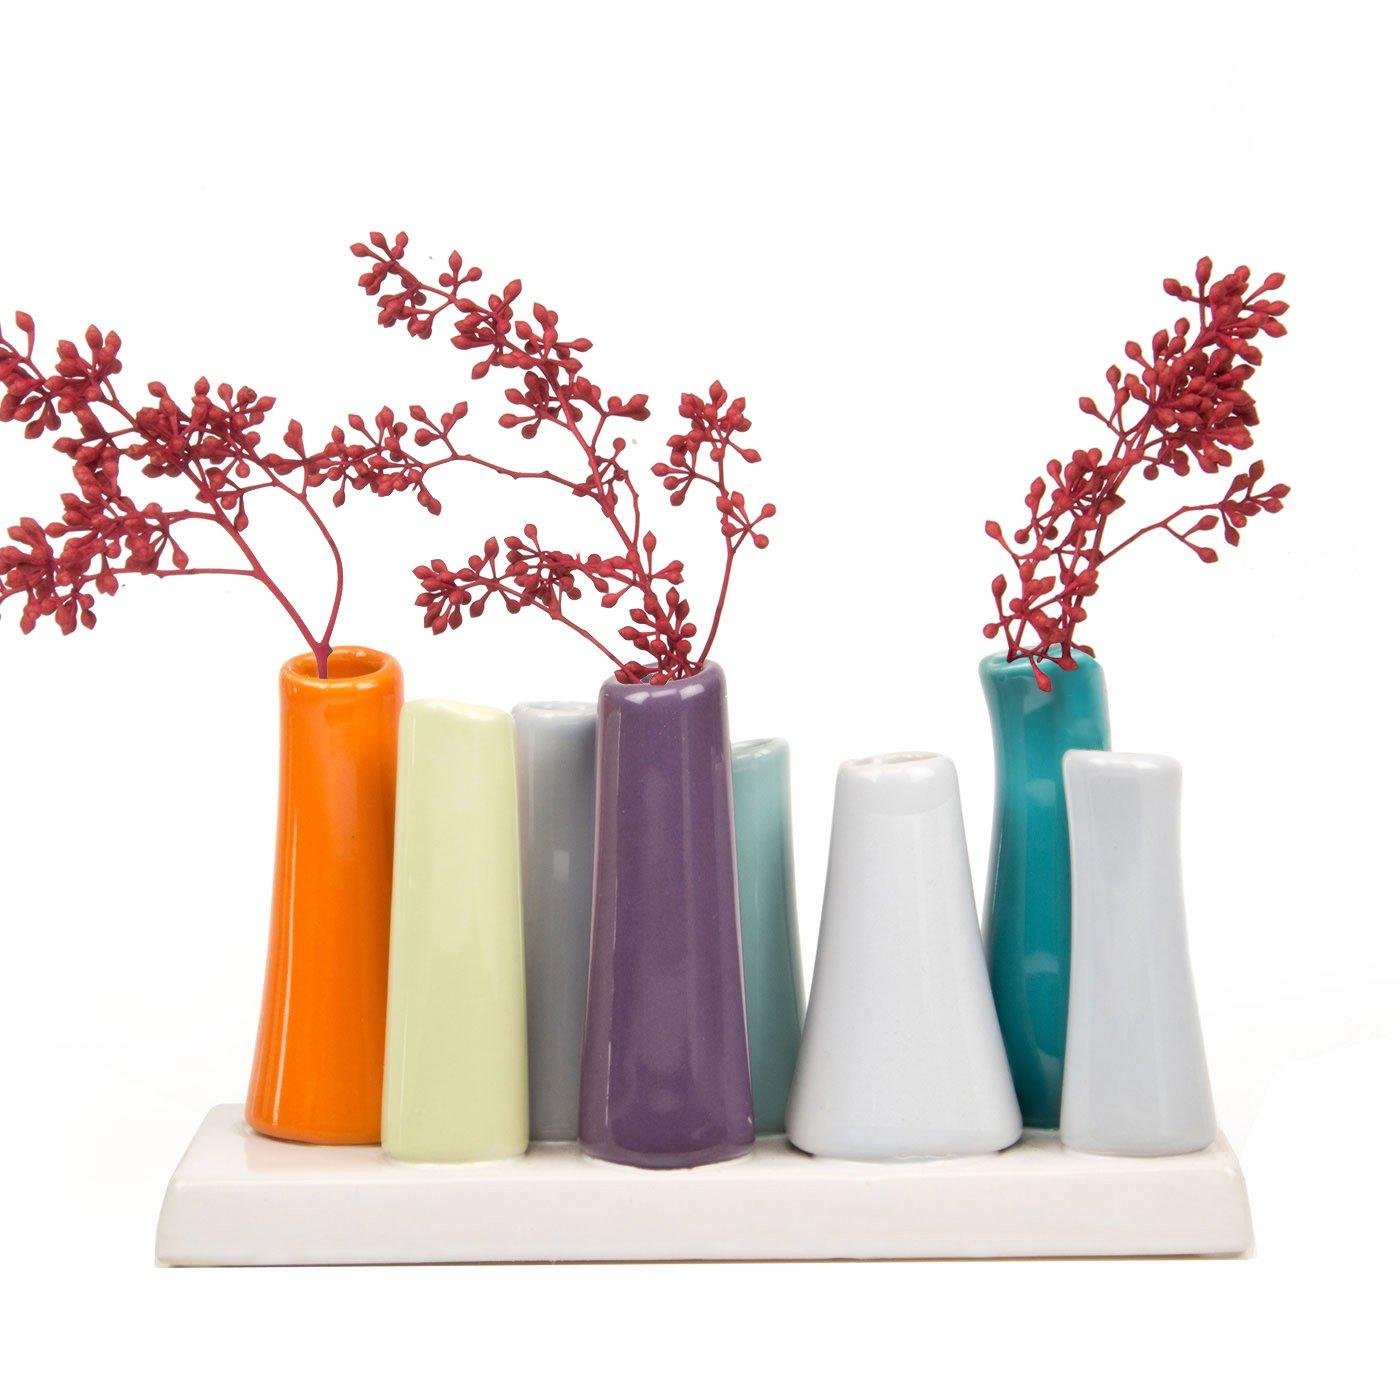 Chive Pooley 8-Tube Vase, Orange